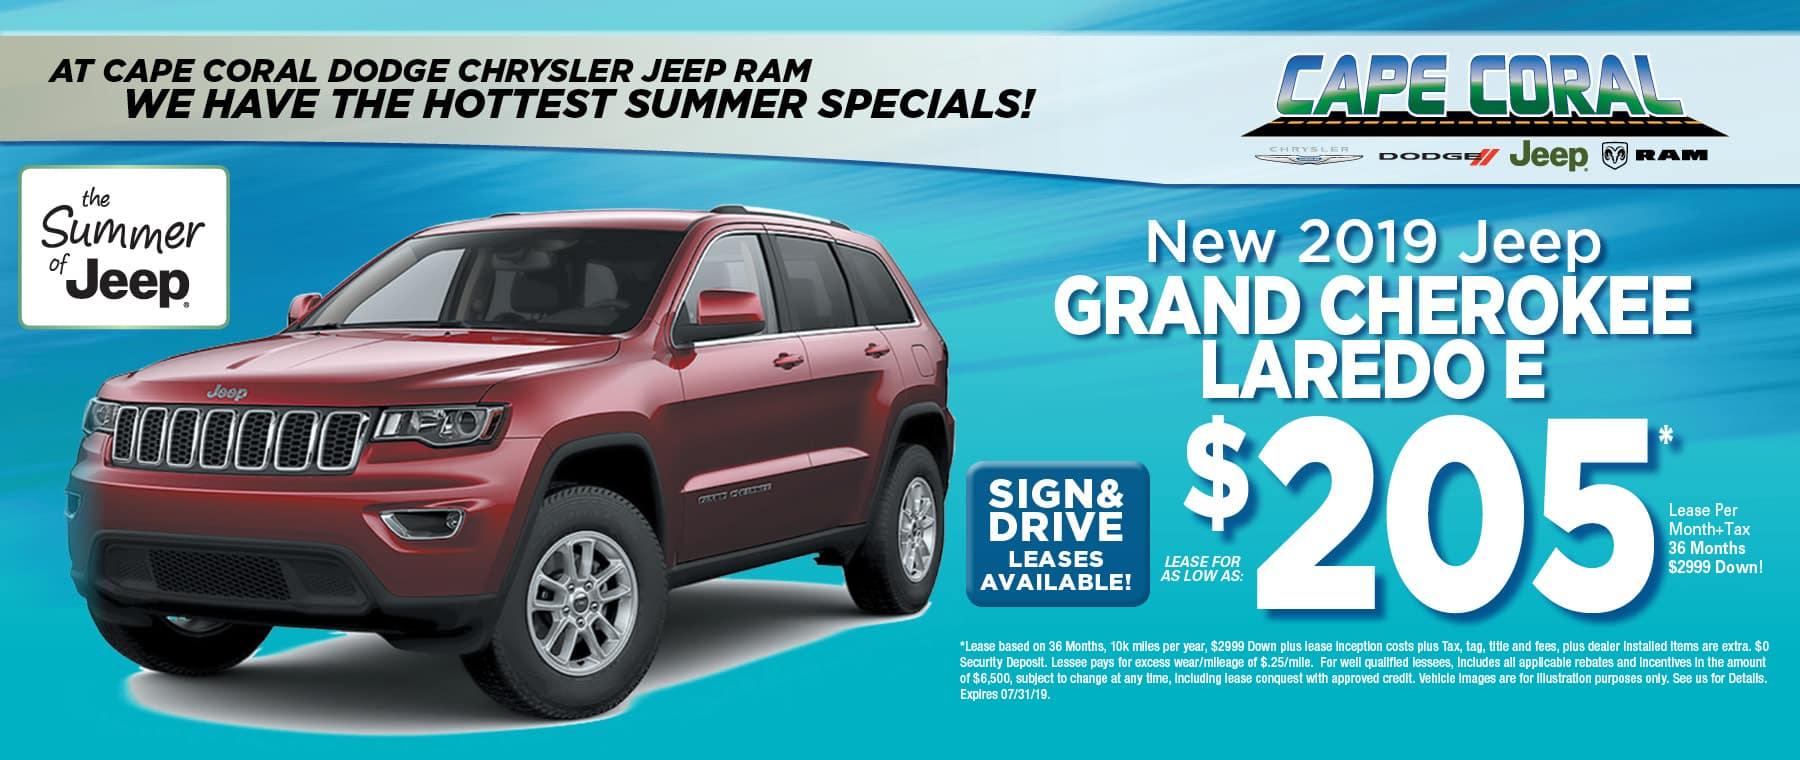 2019 Jeep Grand Cherokees!